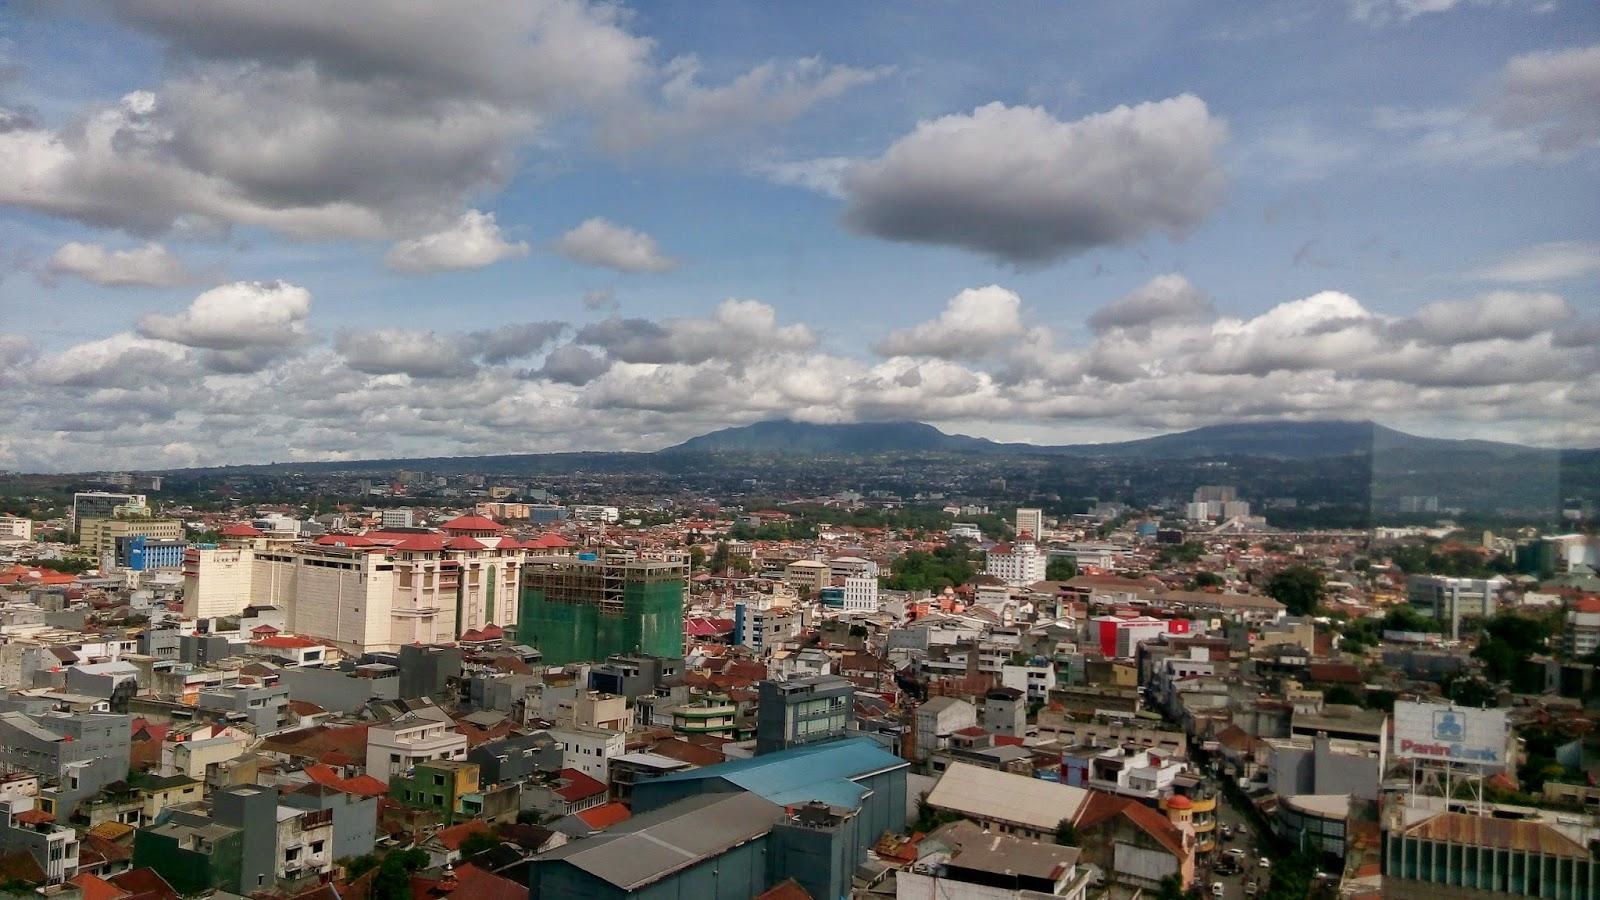 cara melihat kota bandung Dari atas ketinggian, view gunung tangkuban perahu dari atas menara masjid raya